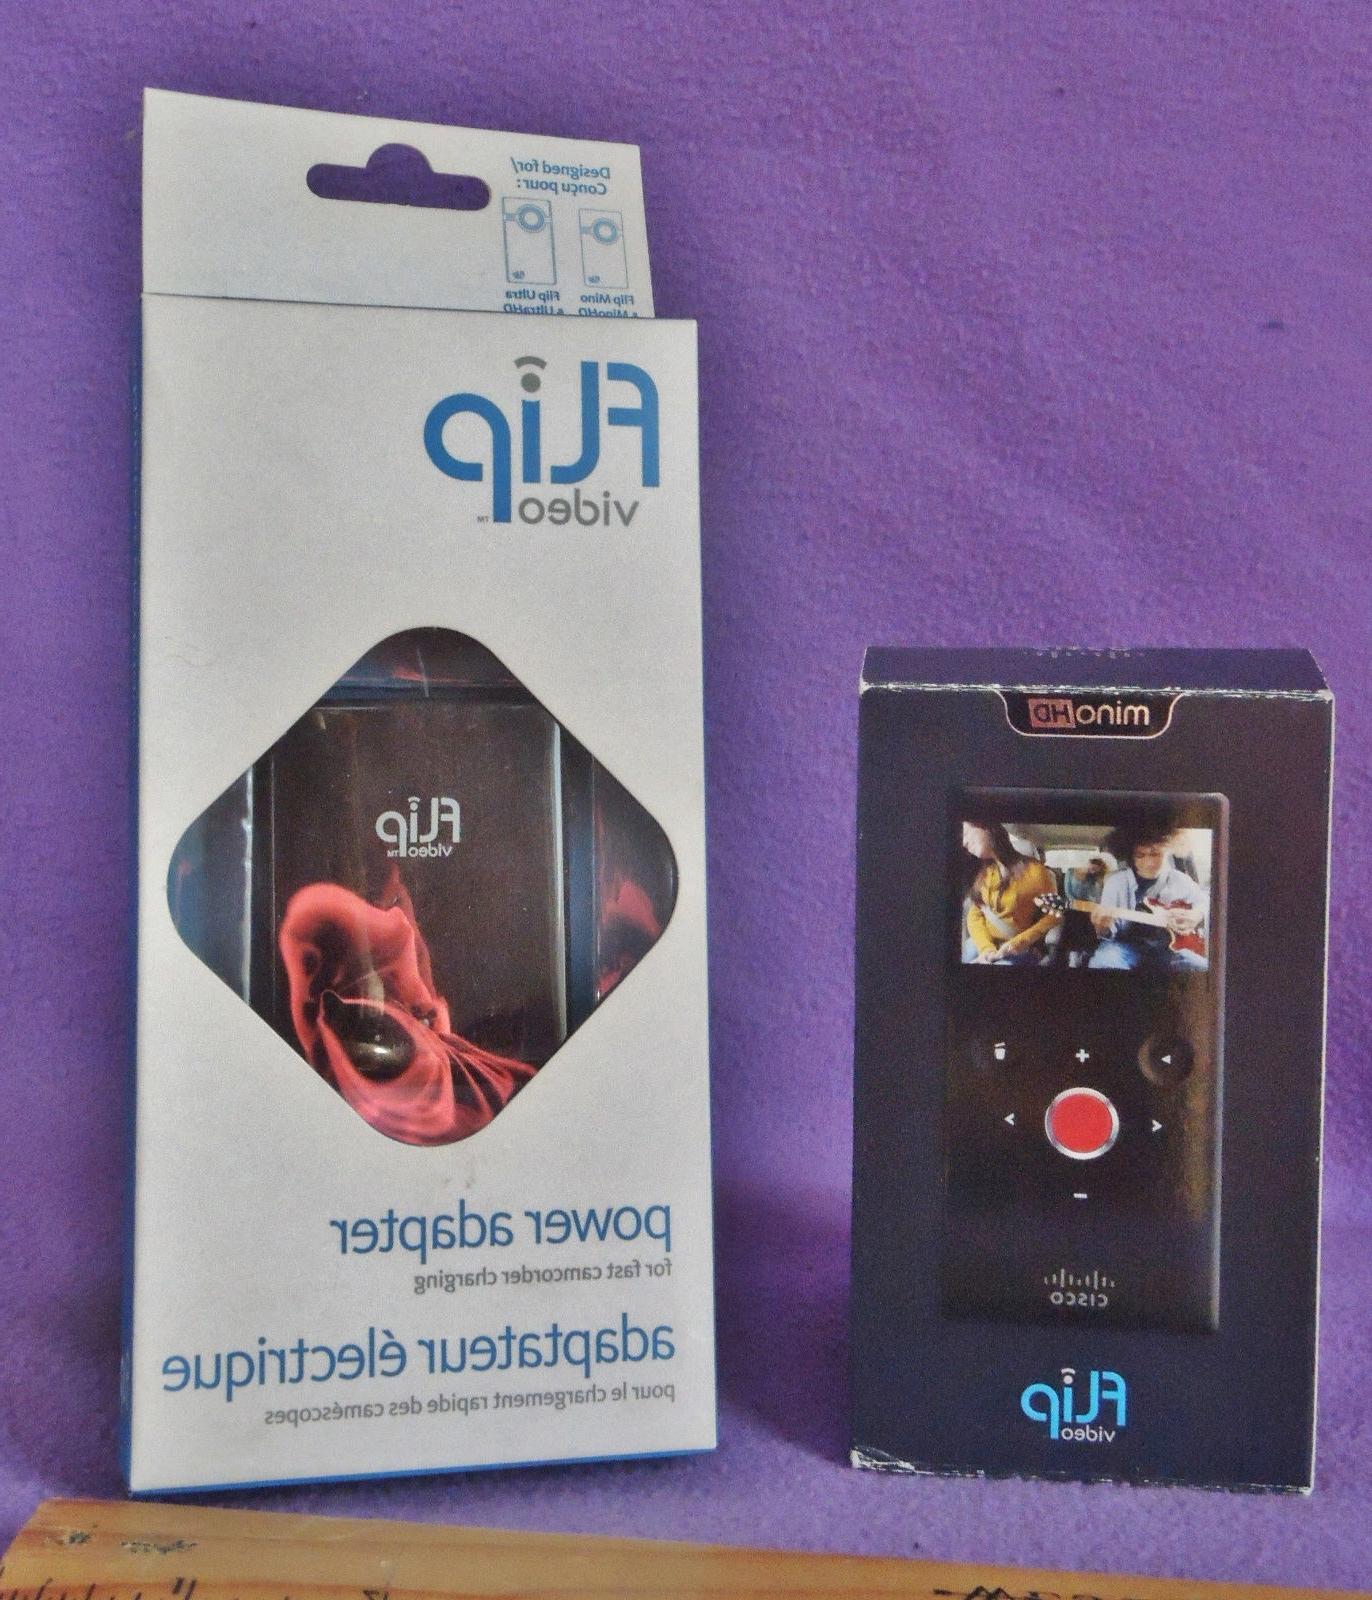 NIB Flip Video Mino HD M3160B 4GB Camcorder Black + Power Ad